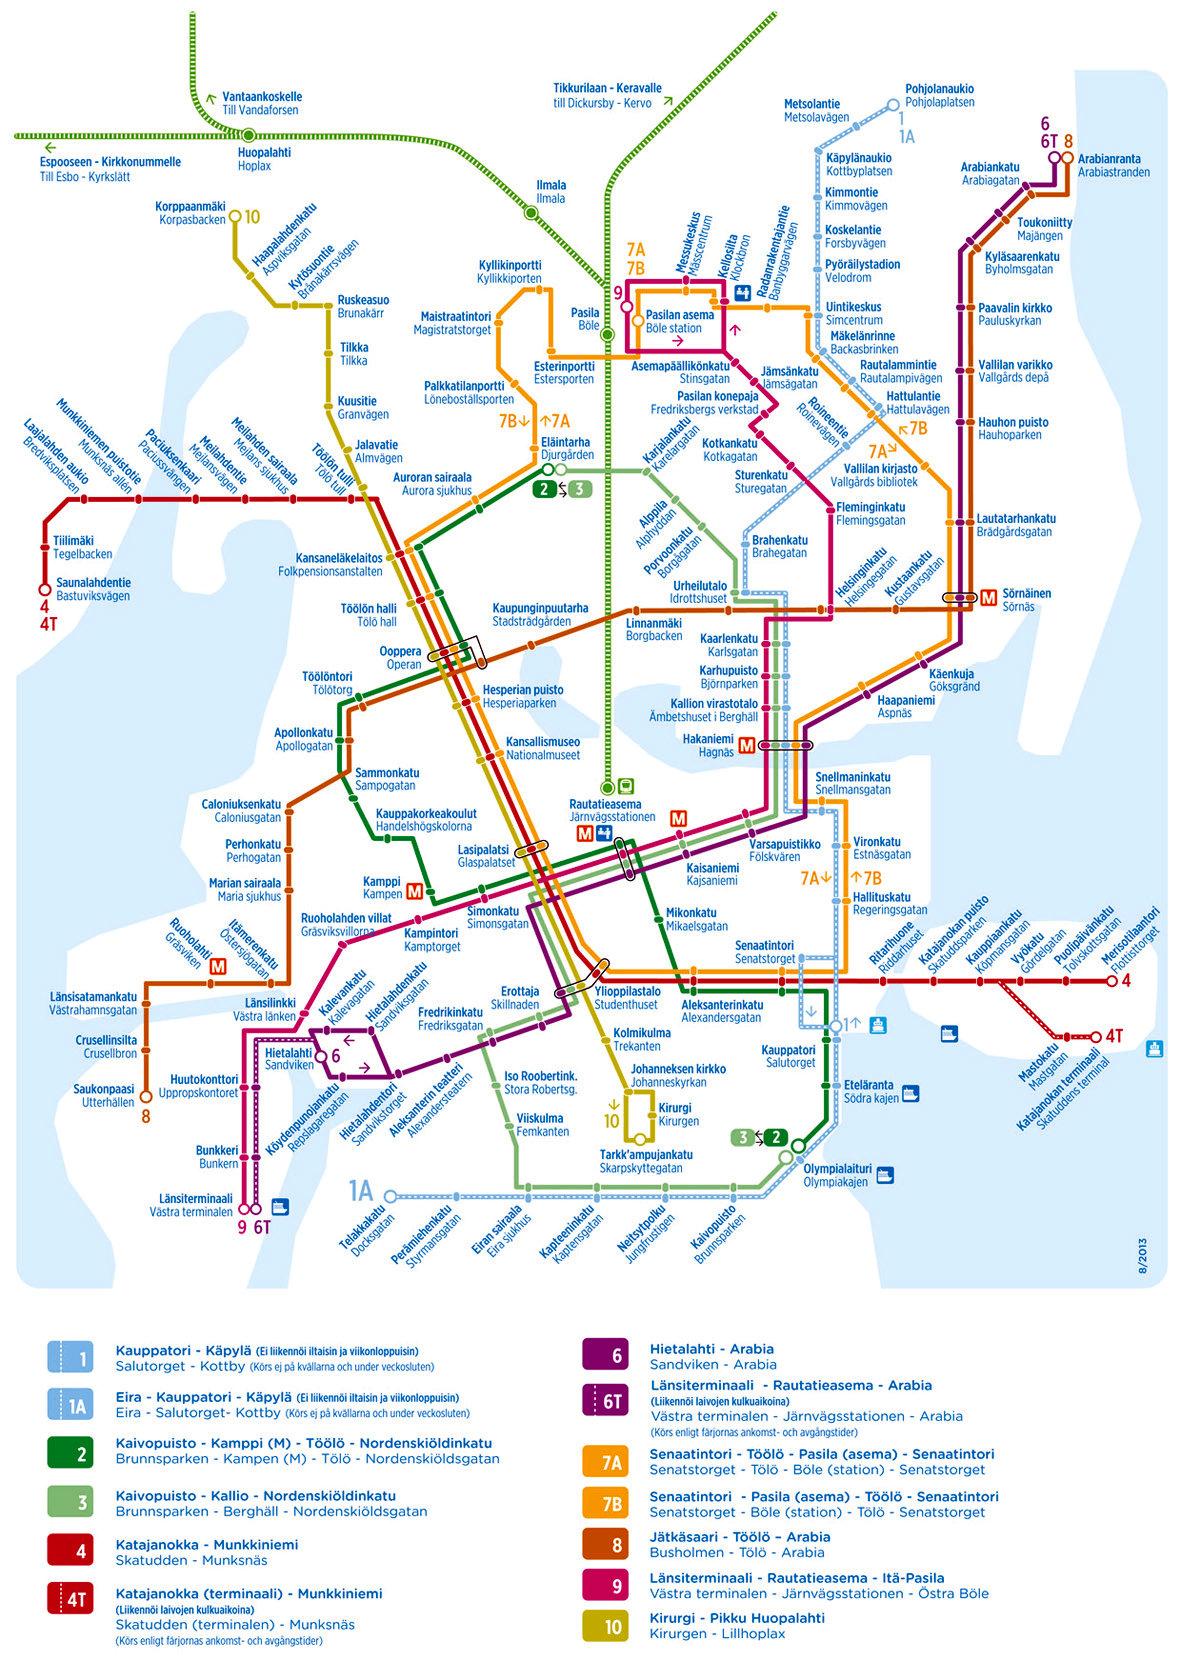 Helsingin Raitiovaunukartta 2014 Aiheet